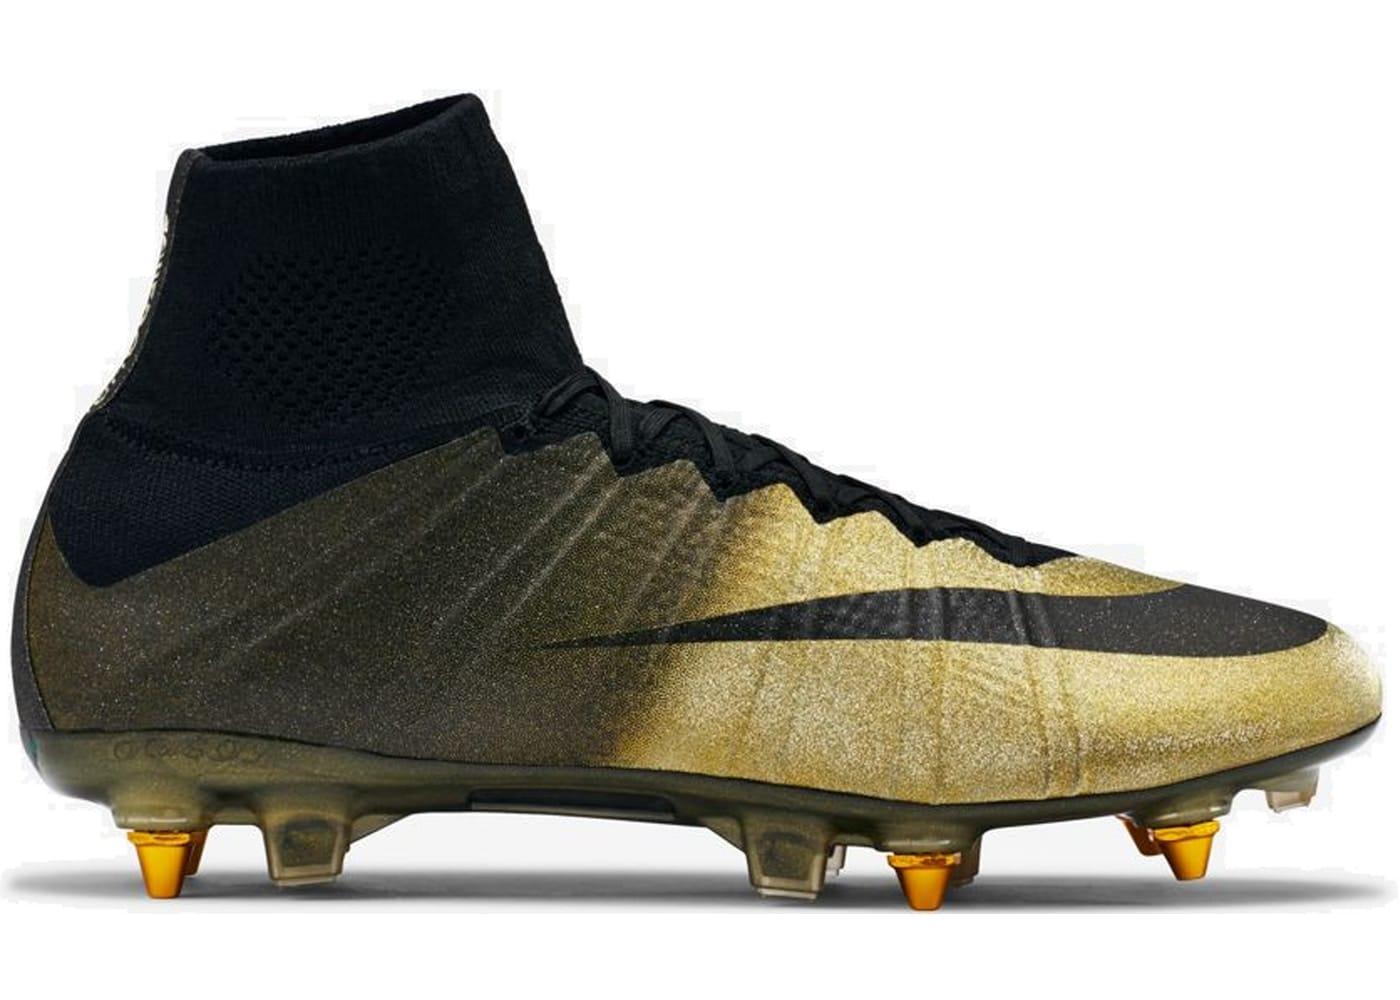 Nike Mercurial Superfly CR7 Cristiano Ronaldo Rare Gold